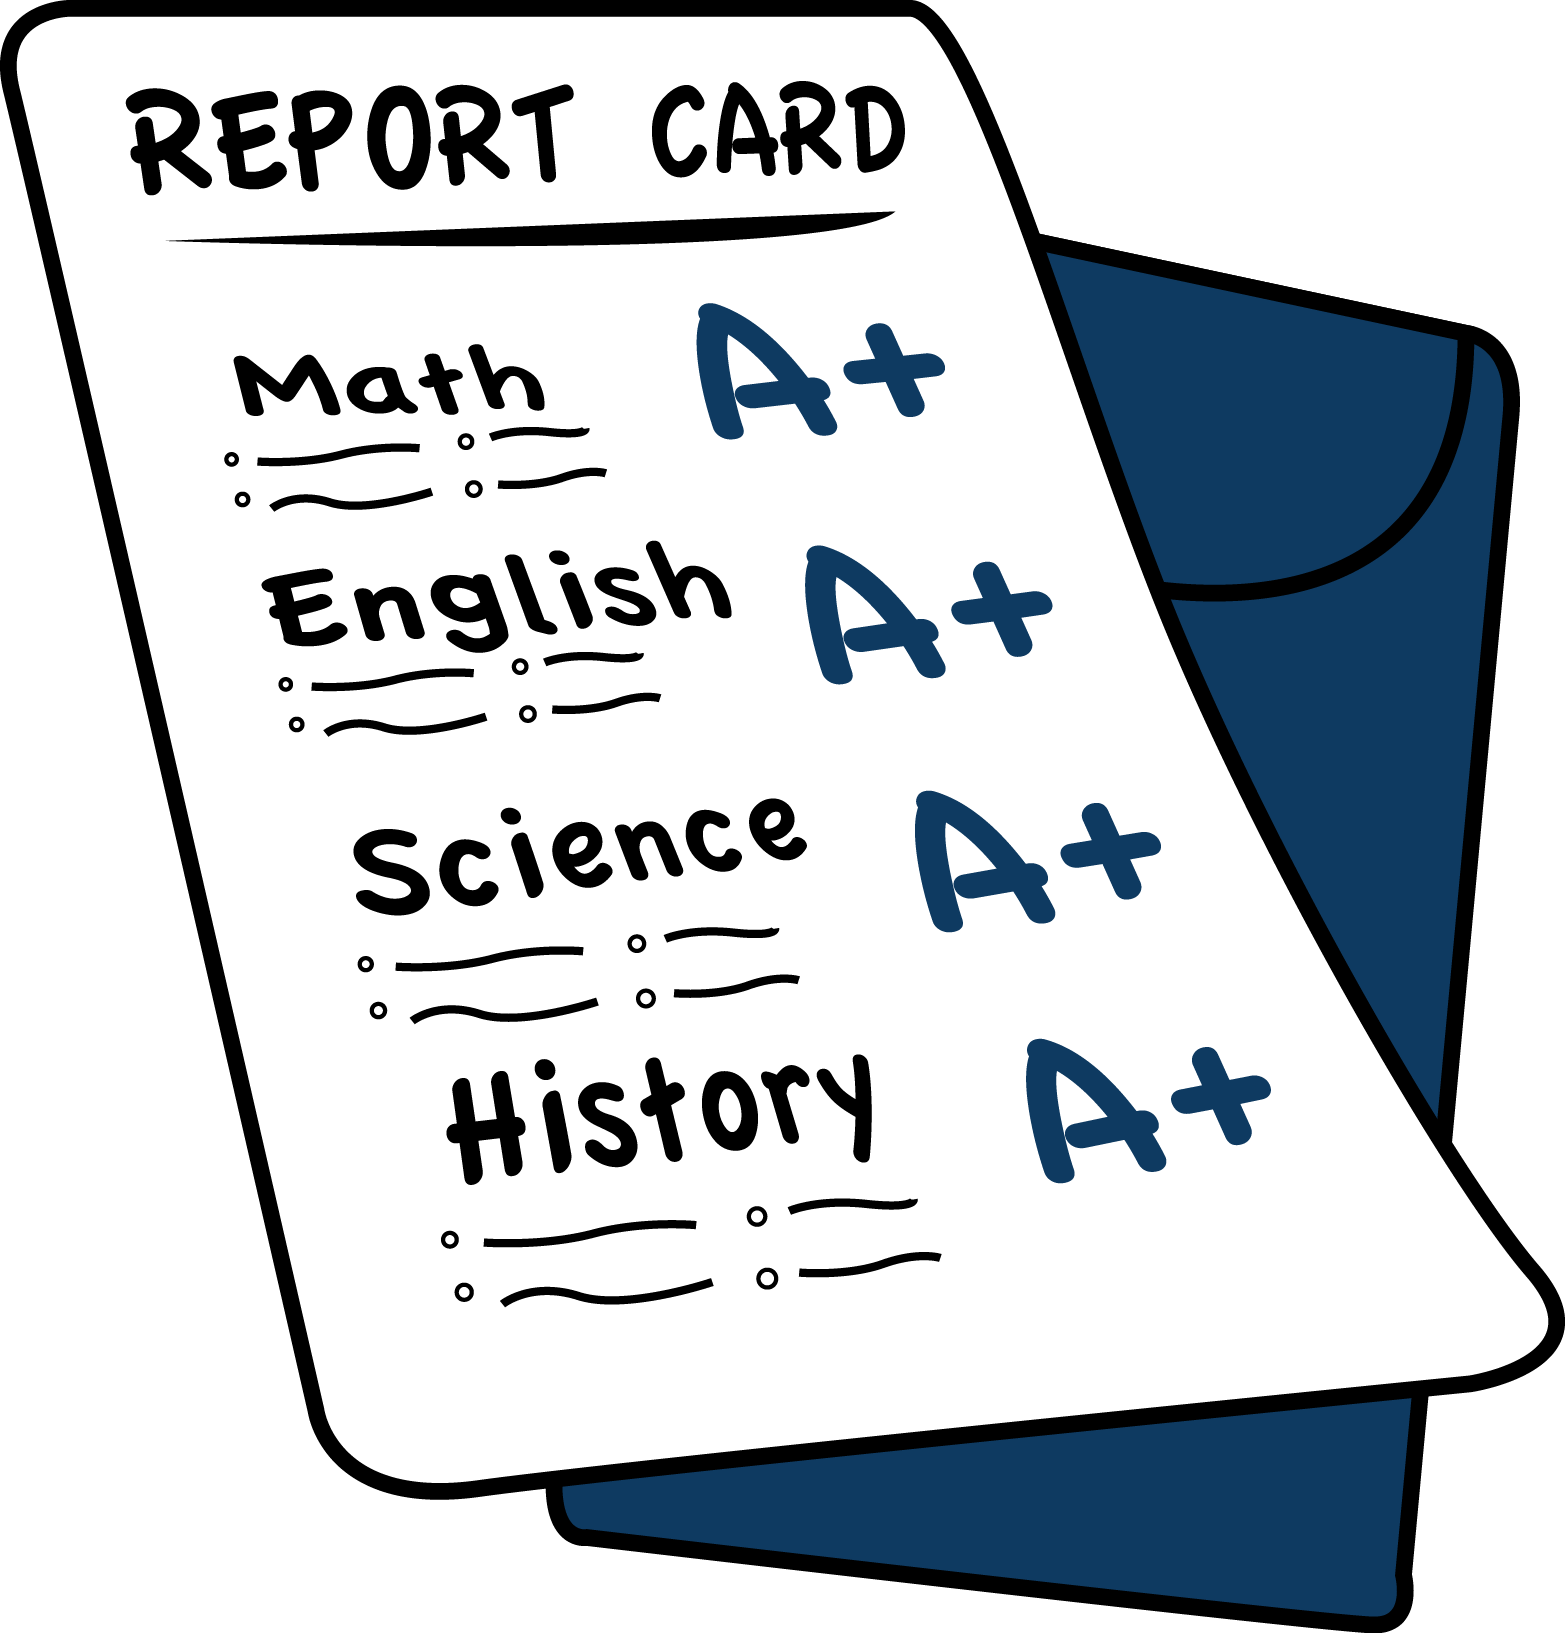 Doc 537559 Report Card Cutler Bay Senior High School